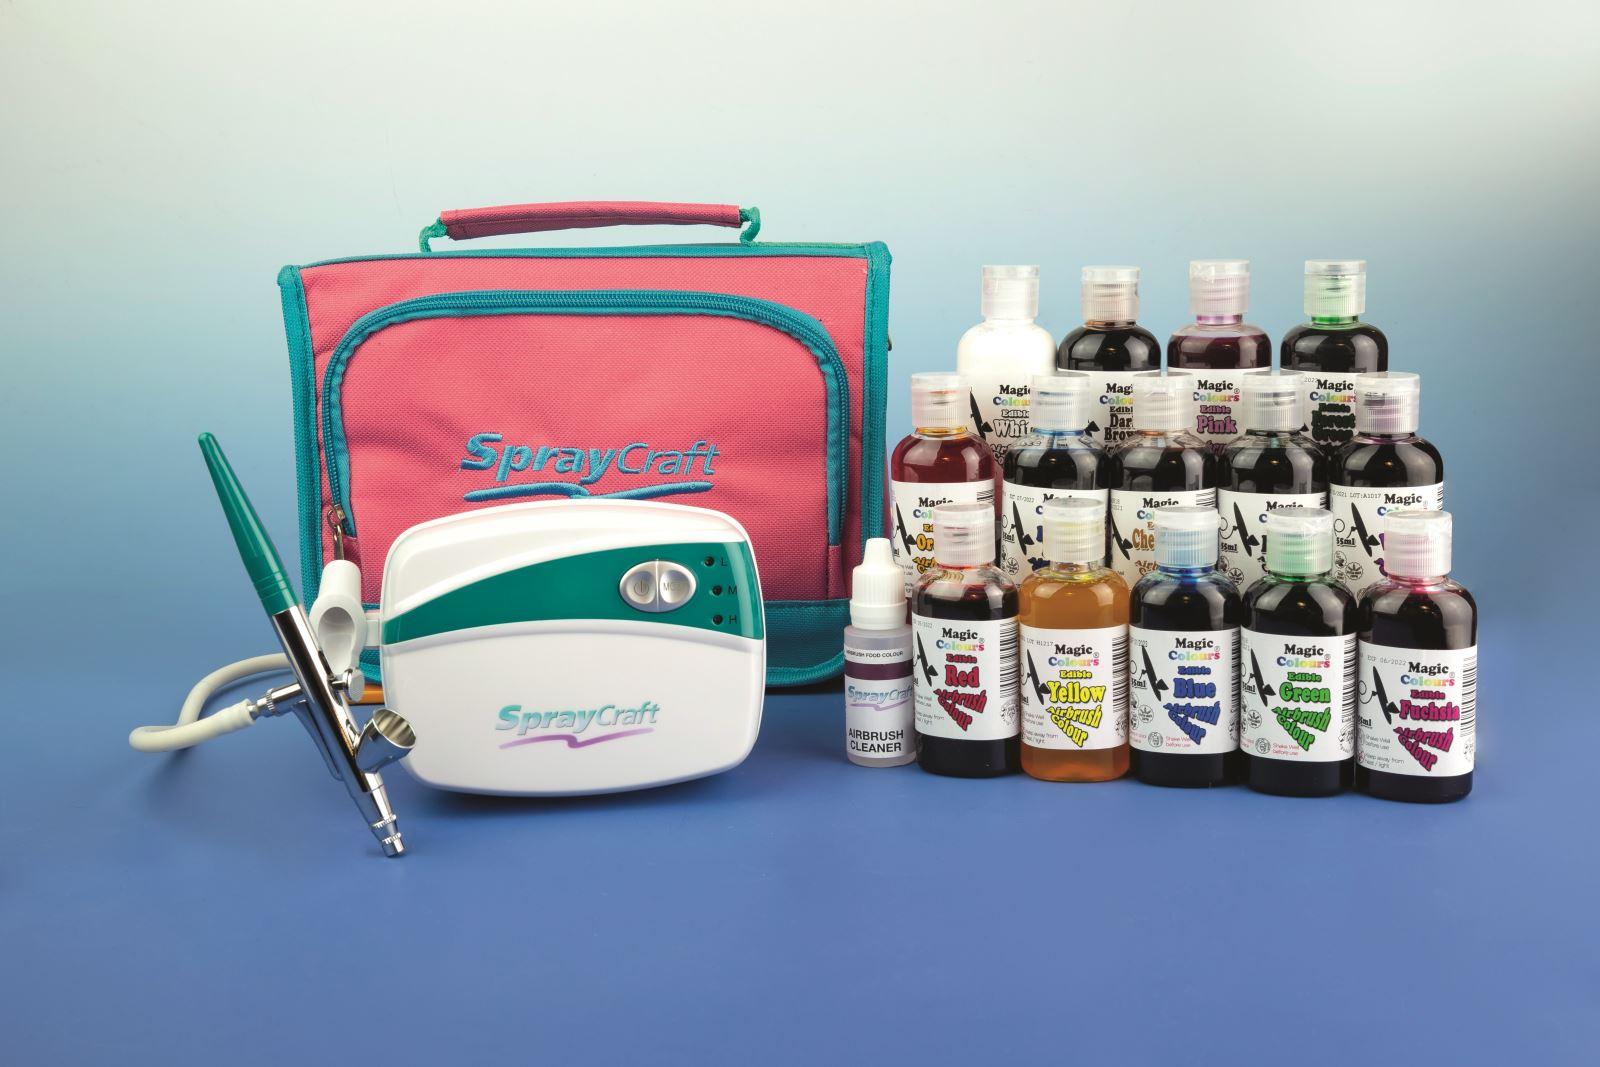 Spraycraft Airbrush full set reader offer